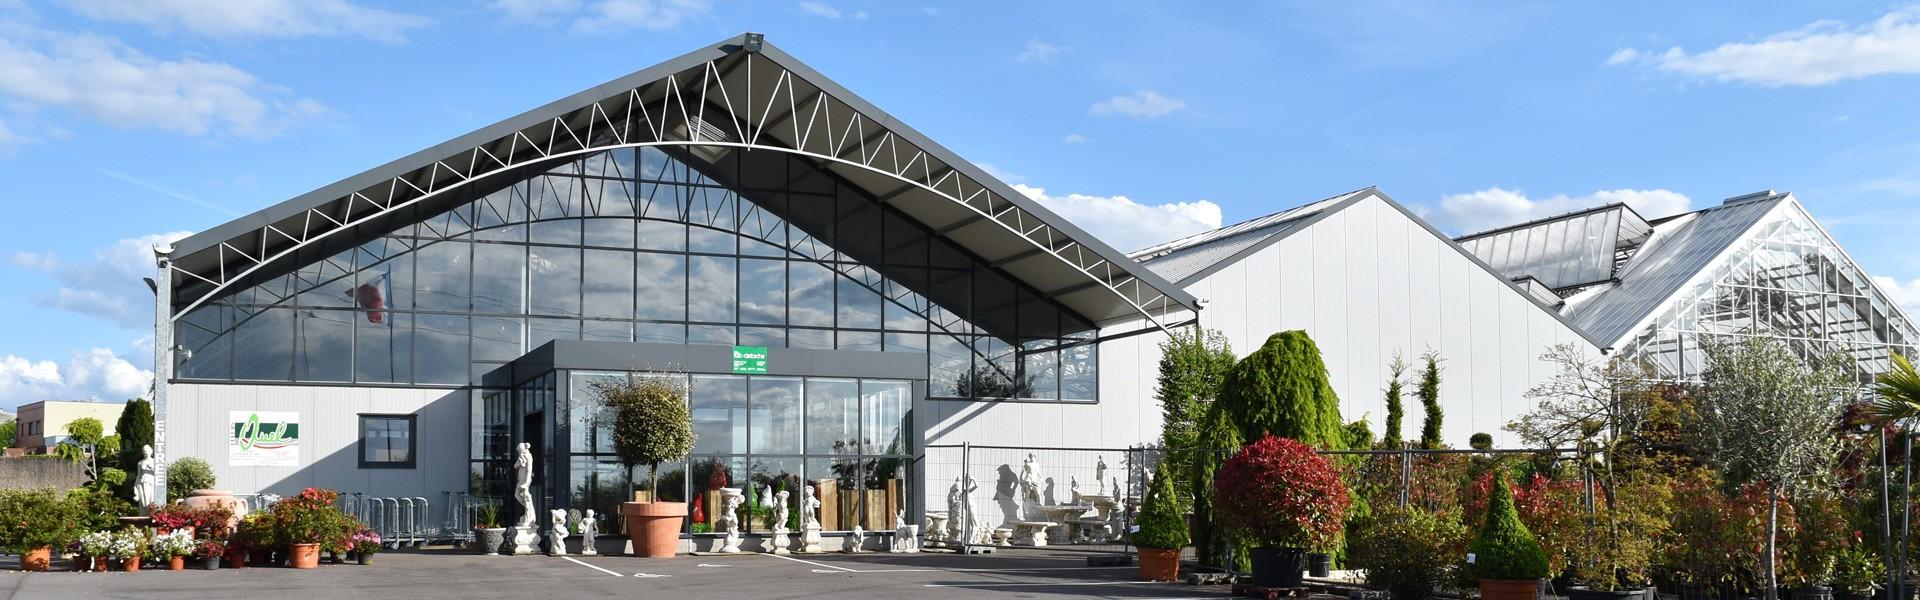 Garden Center Quel, votre fleuriste en Moselle